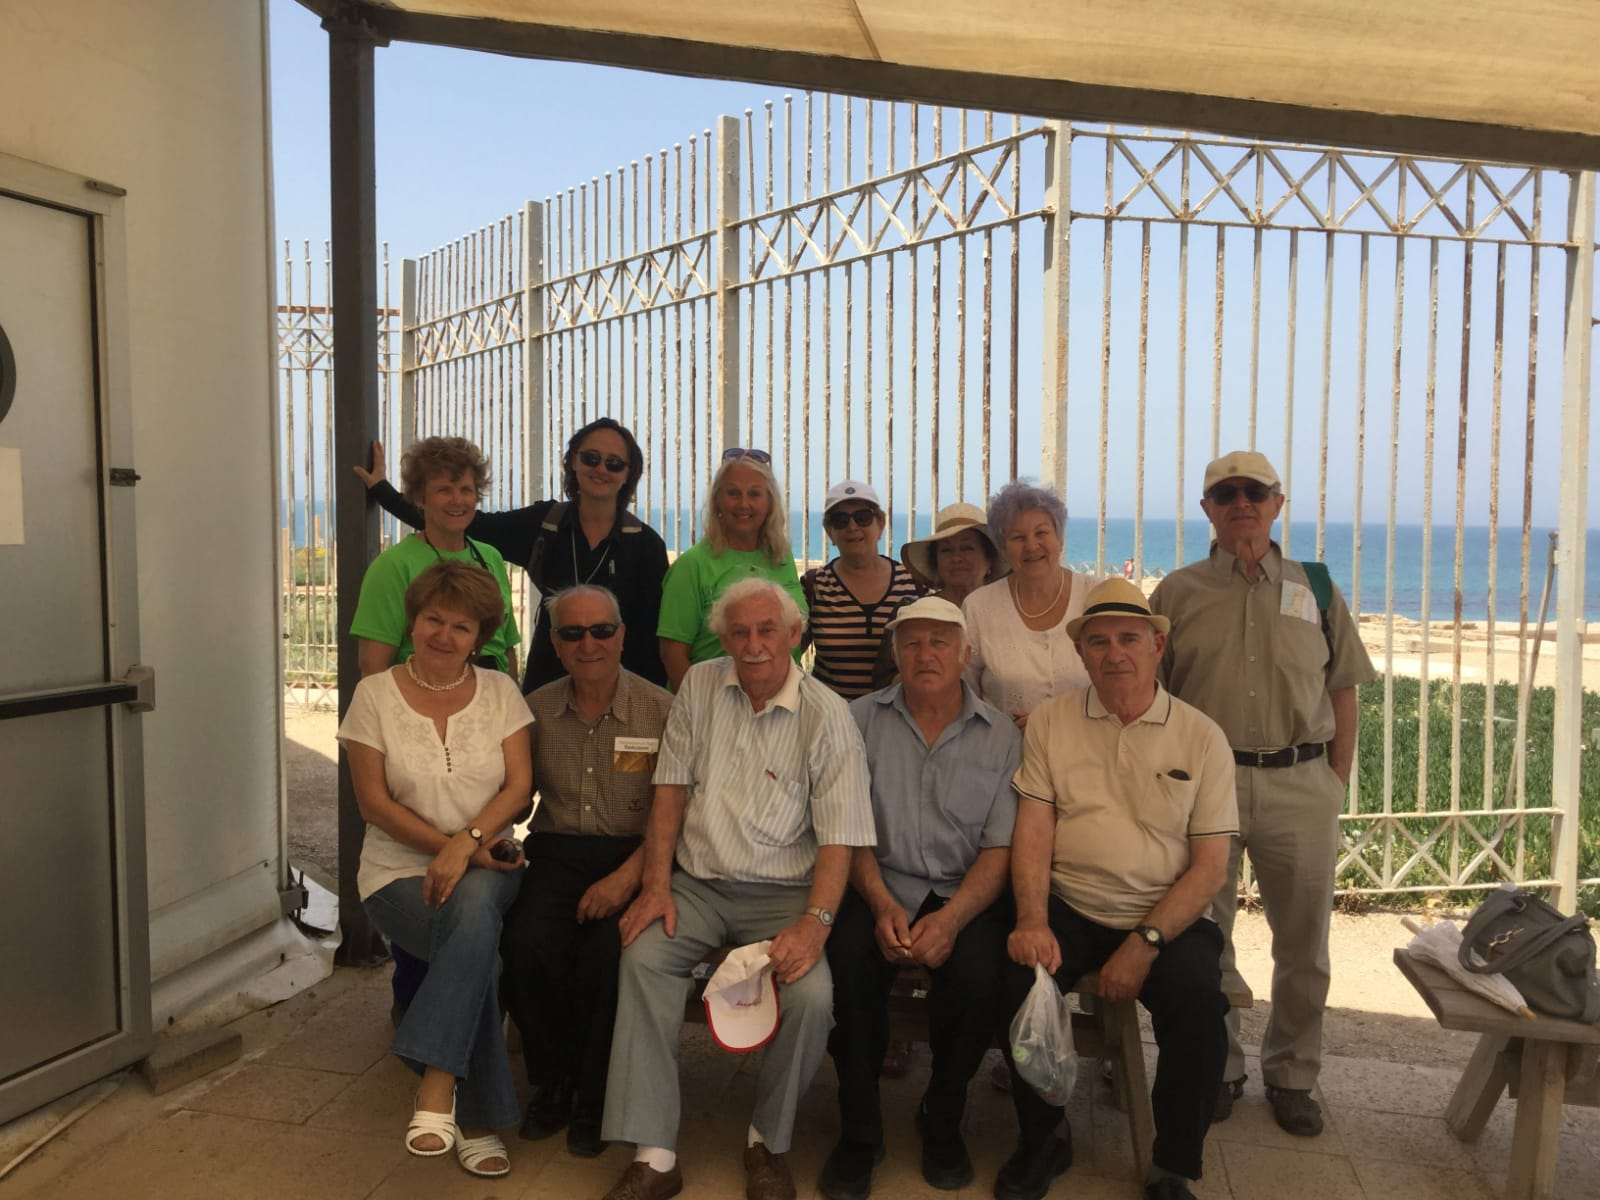 Trip w Holocaust survivors and volunteers